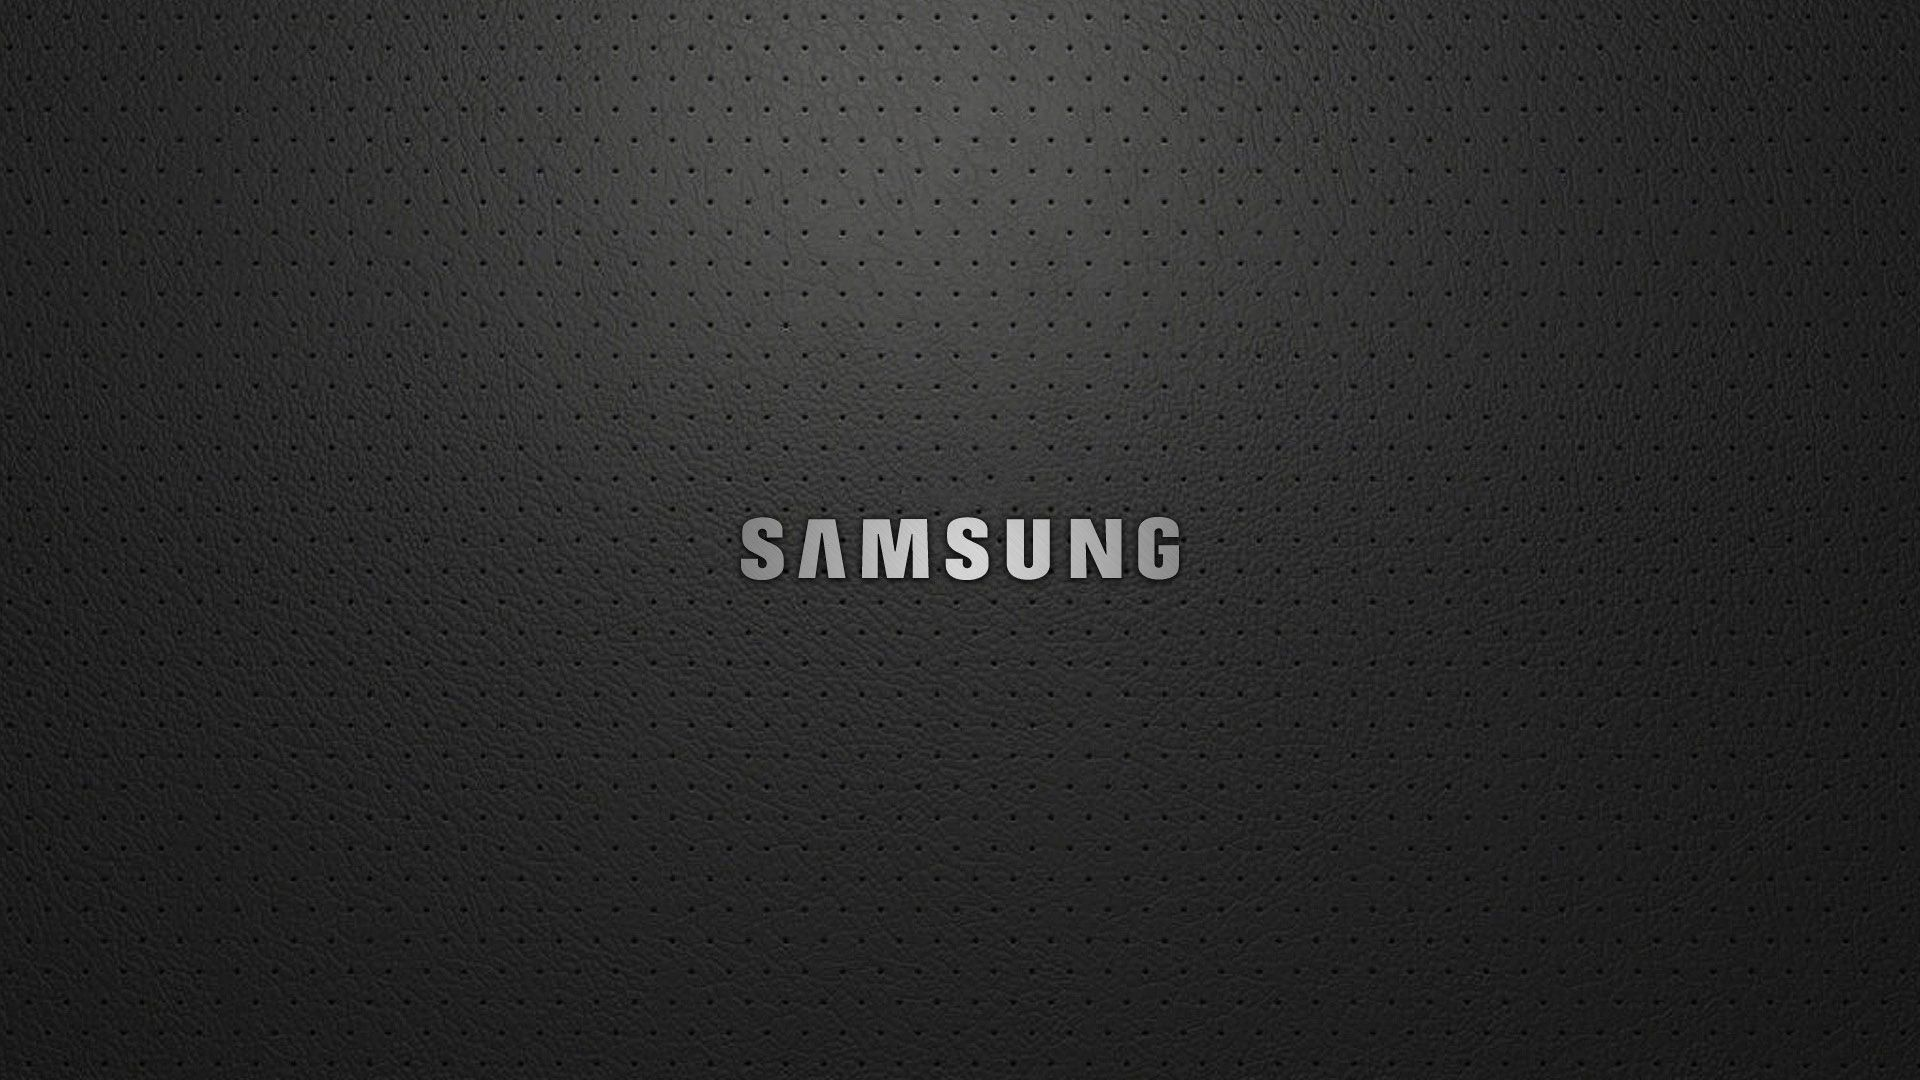 Hd wallpaper samsung - Download Samsung Galaxy S Wallpapers